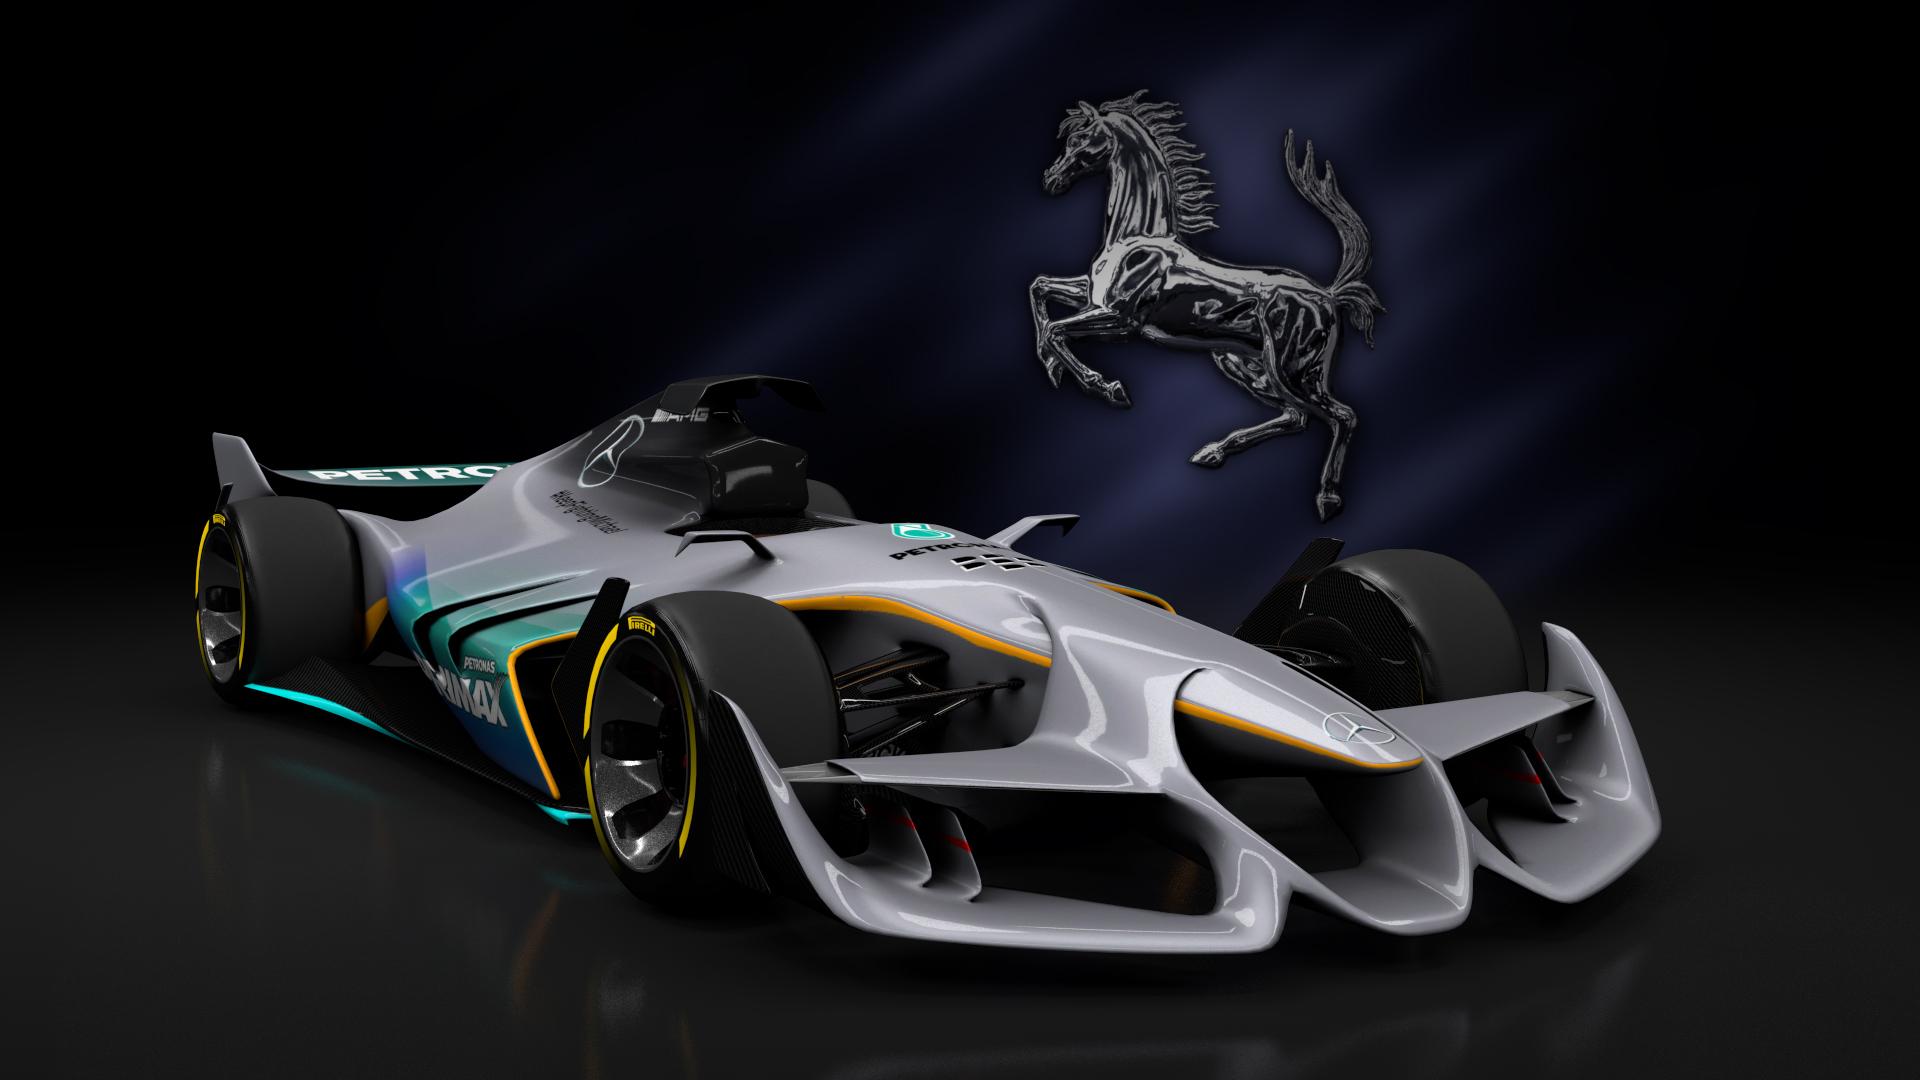 Ferrari F1 Concept Formula Car Detail Assetto Corsa